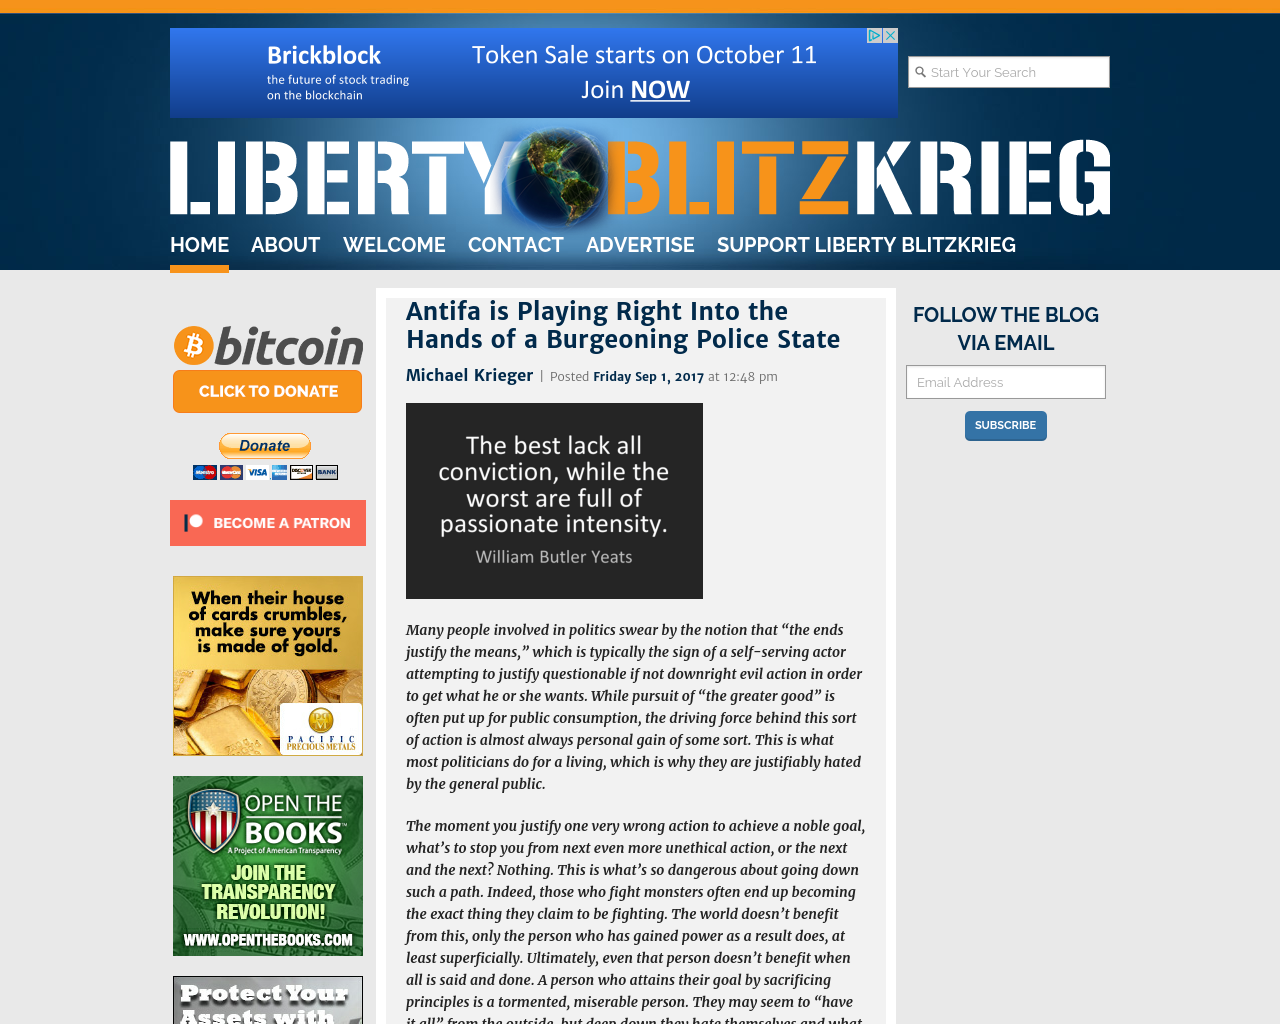 Liberty-Blitzkrieg-LLC-Advertising-Reviews-Pricing